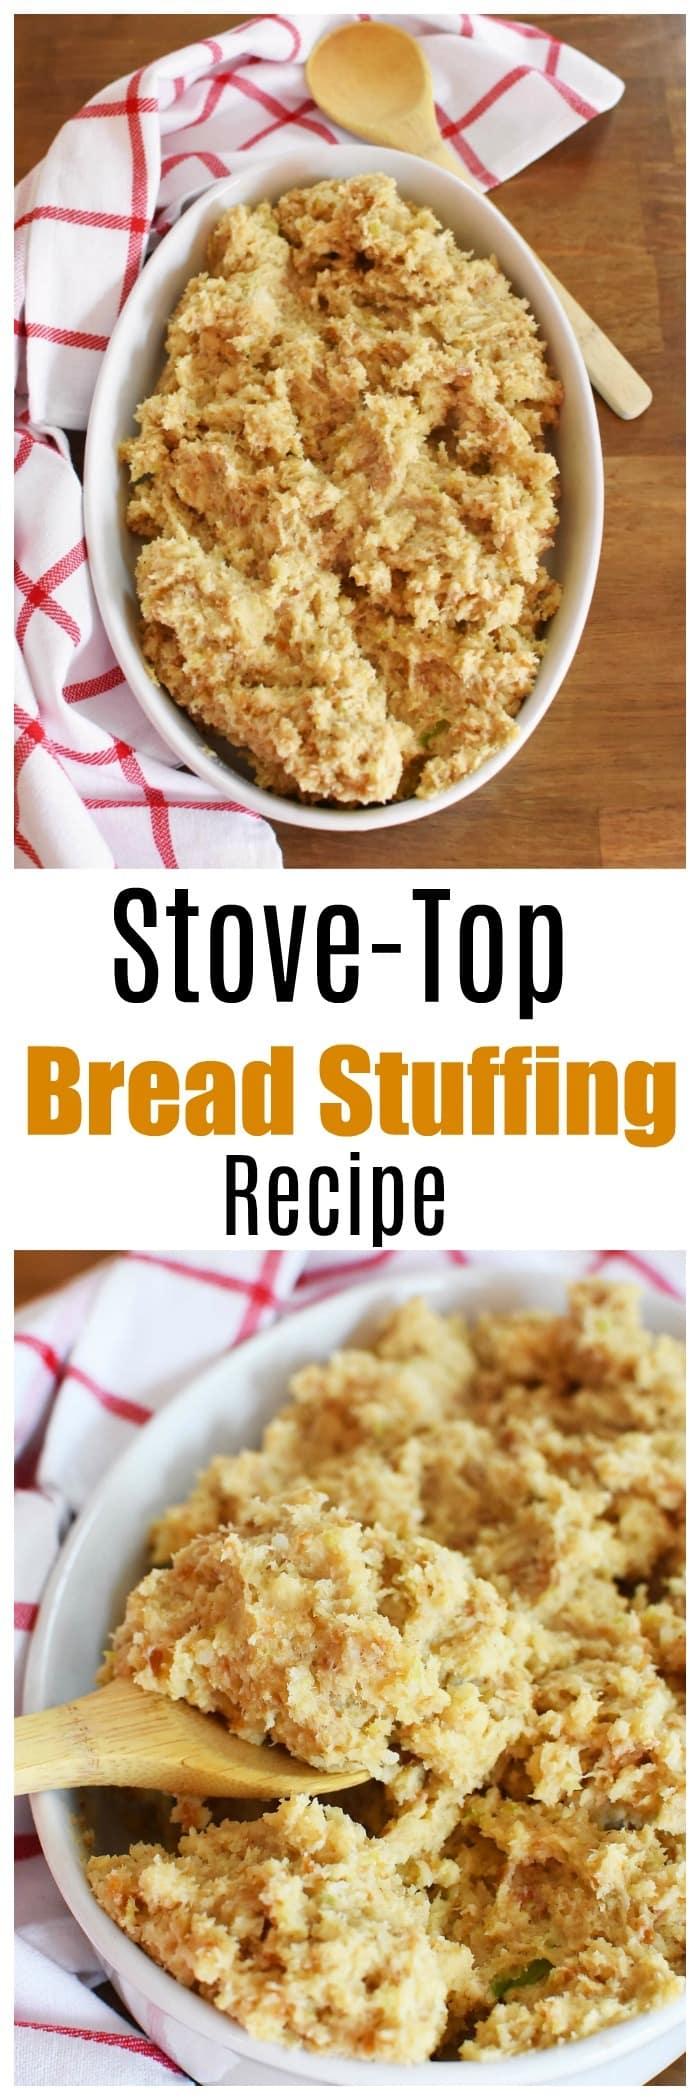 Easy Bread Stuffing Recipe